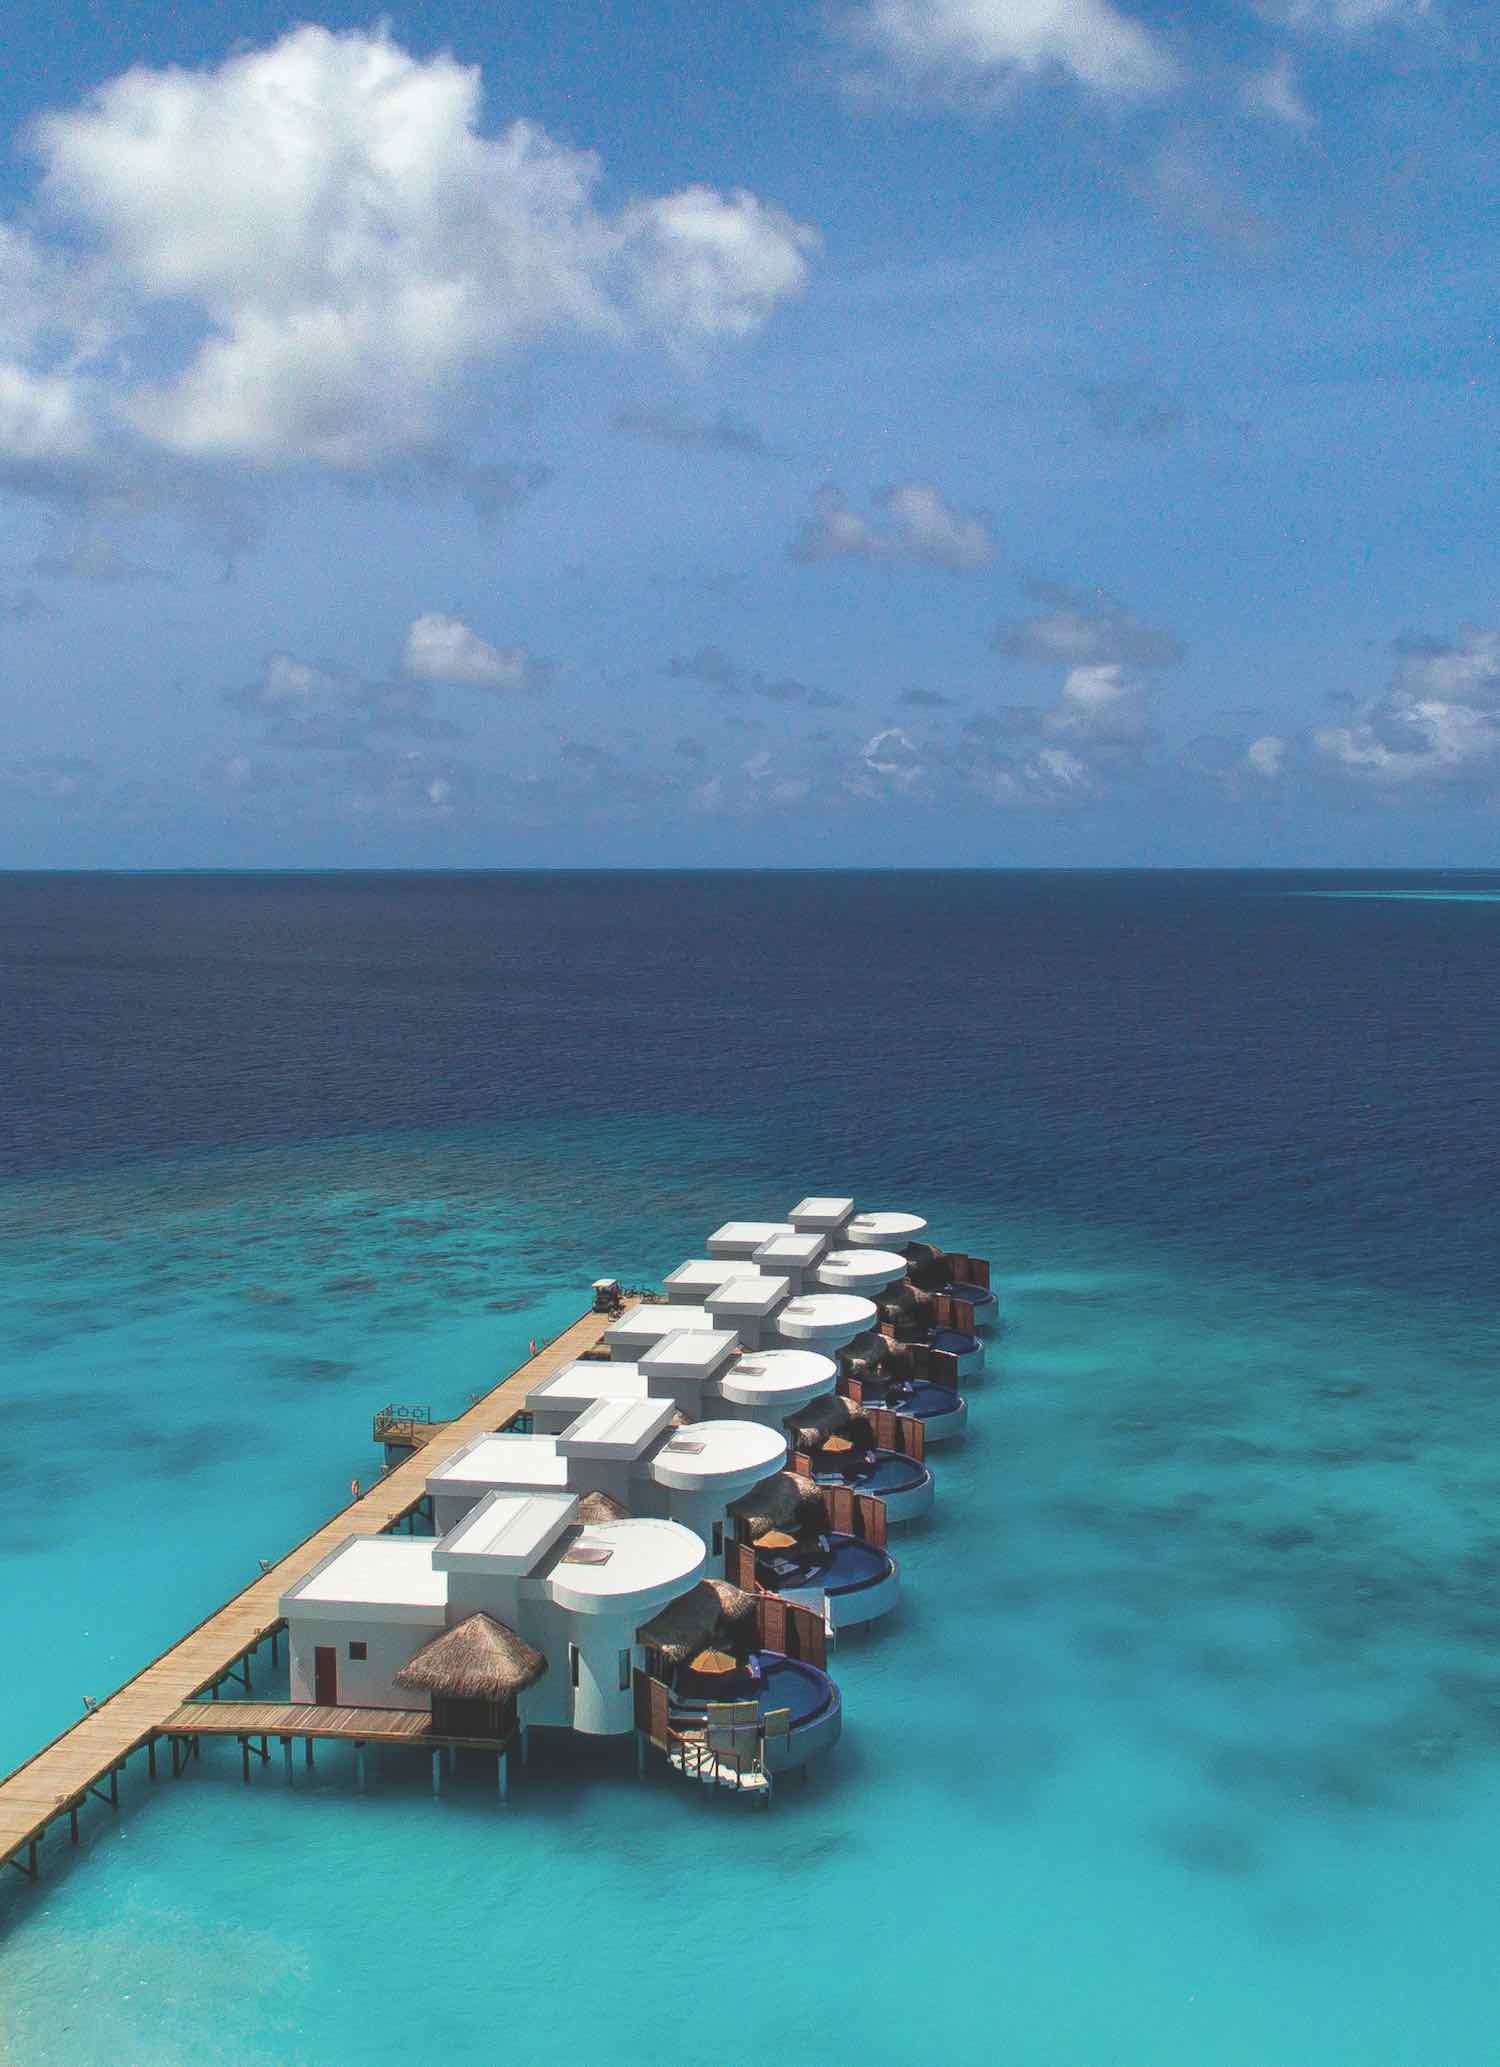 maldives-oblu-select-at-sangeli-honeymoon-water-suite-5-holiday-honeymoon-vacation-invite-to-paradise.jpg